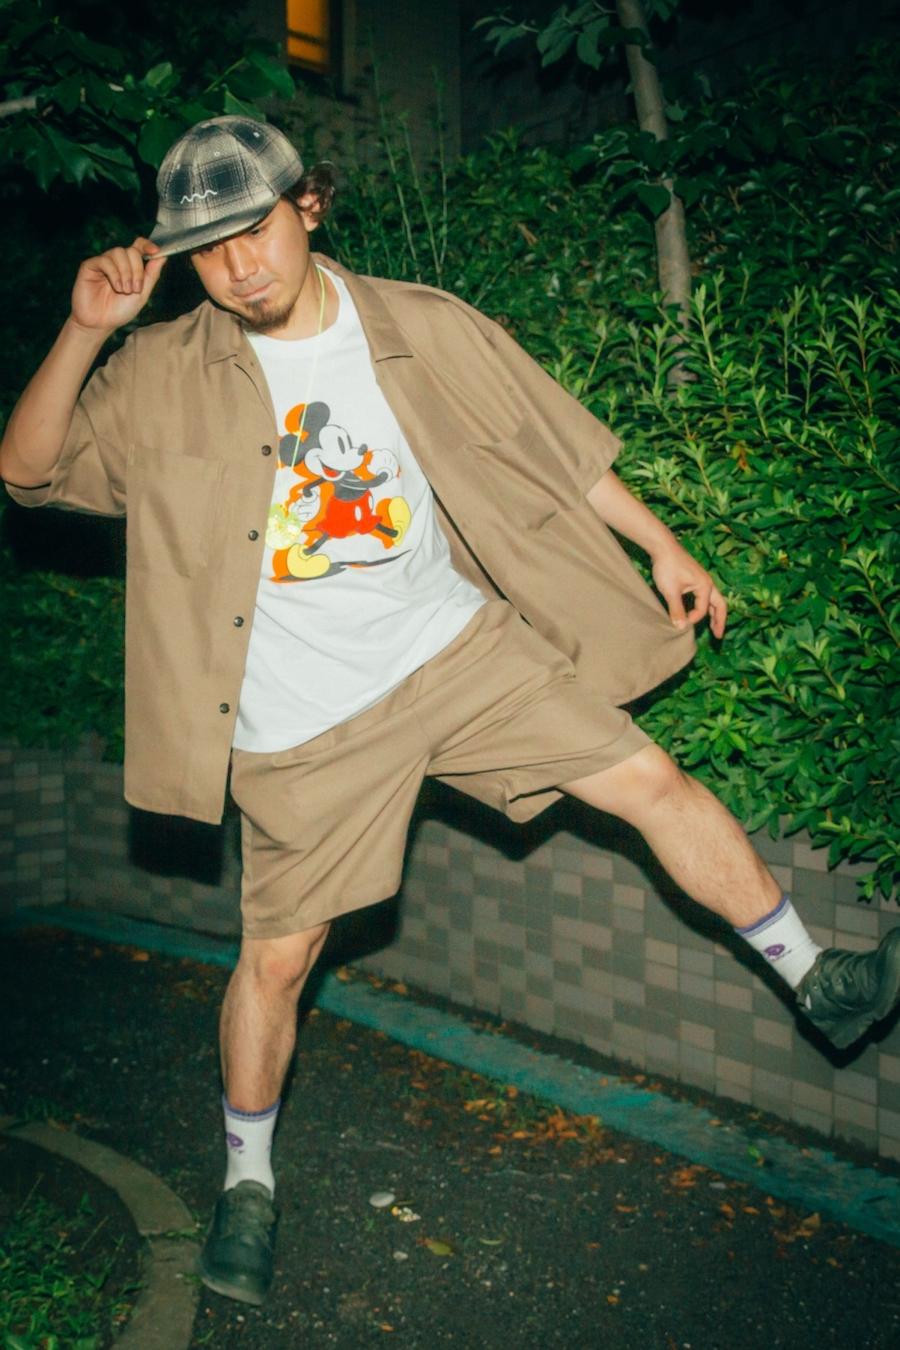 0616_news_fujirock-2021-good03_31 【ファッションスナップ】フジロック'21に行くならば 期間限定フジロックTシャツ特集 #fujirock